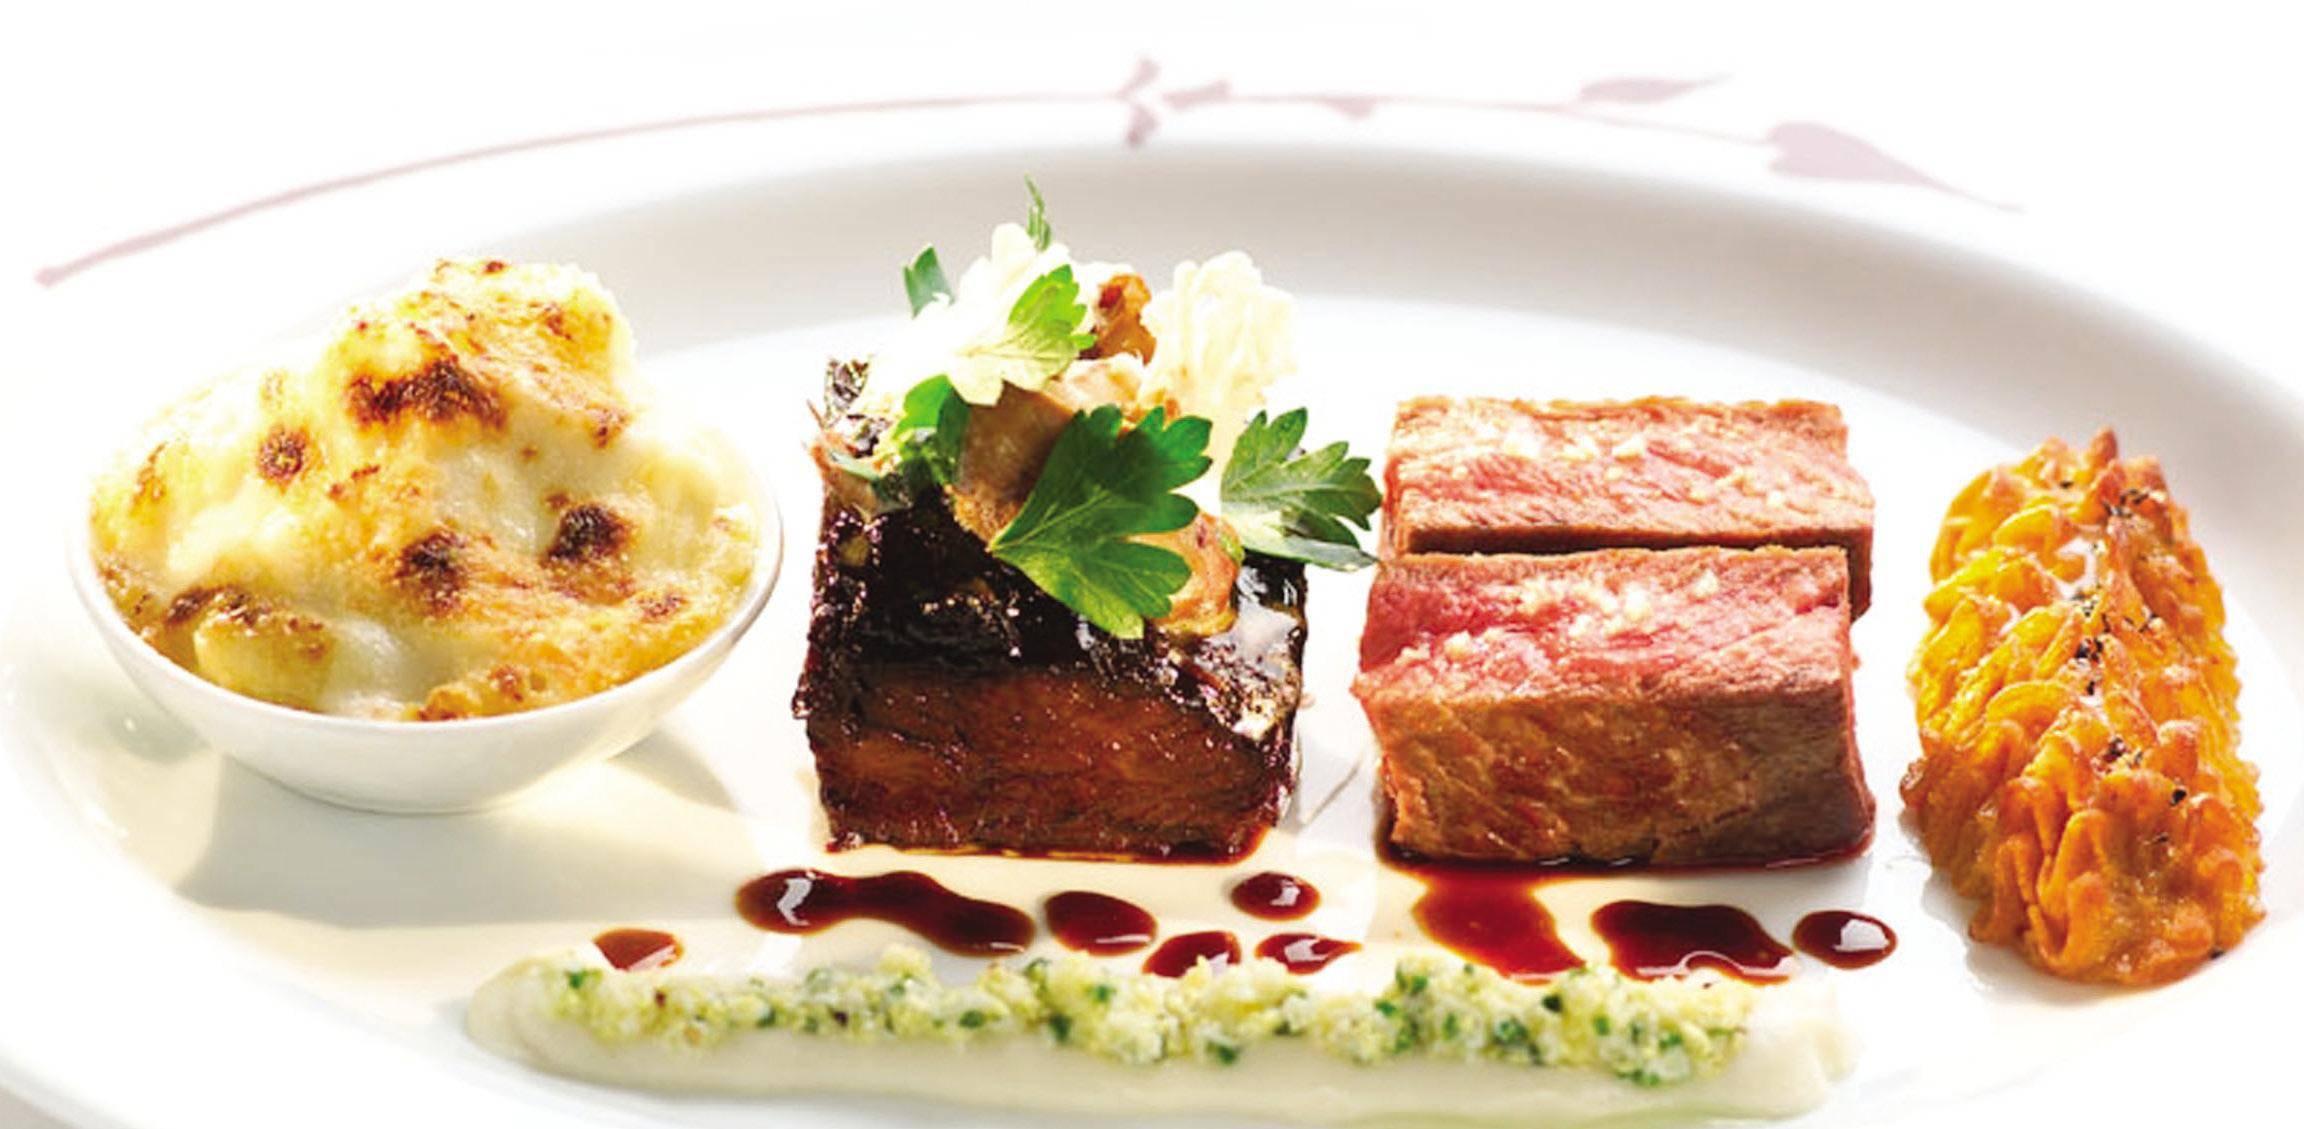 Bon appetit haute cuisine new york jean georges bouley la grenouille and more haute living - French haute cuisine dishes ...